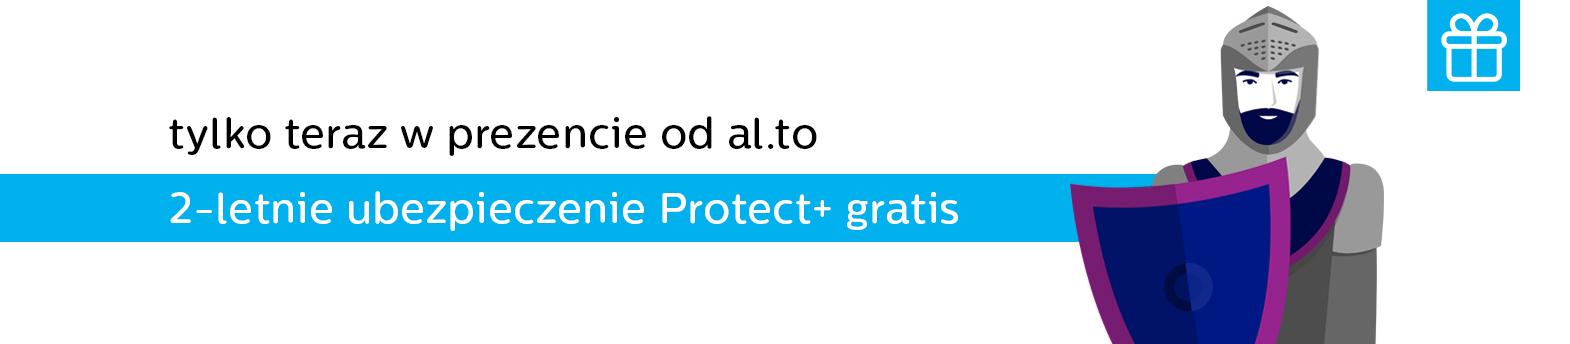 dodatkowa ochrona gratis